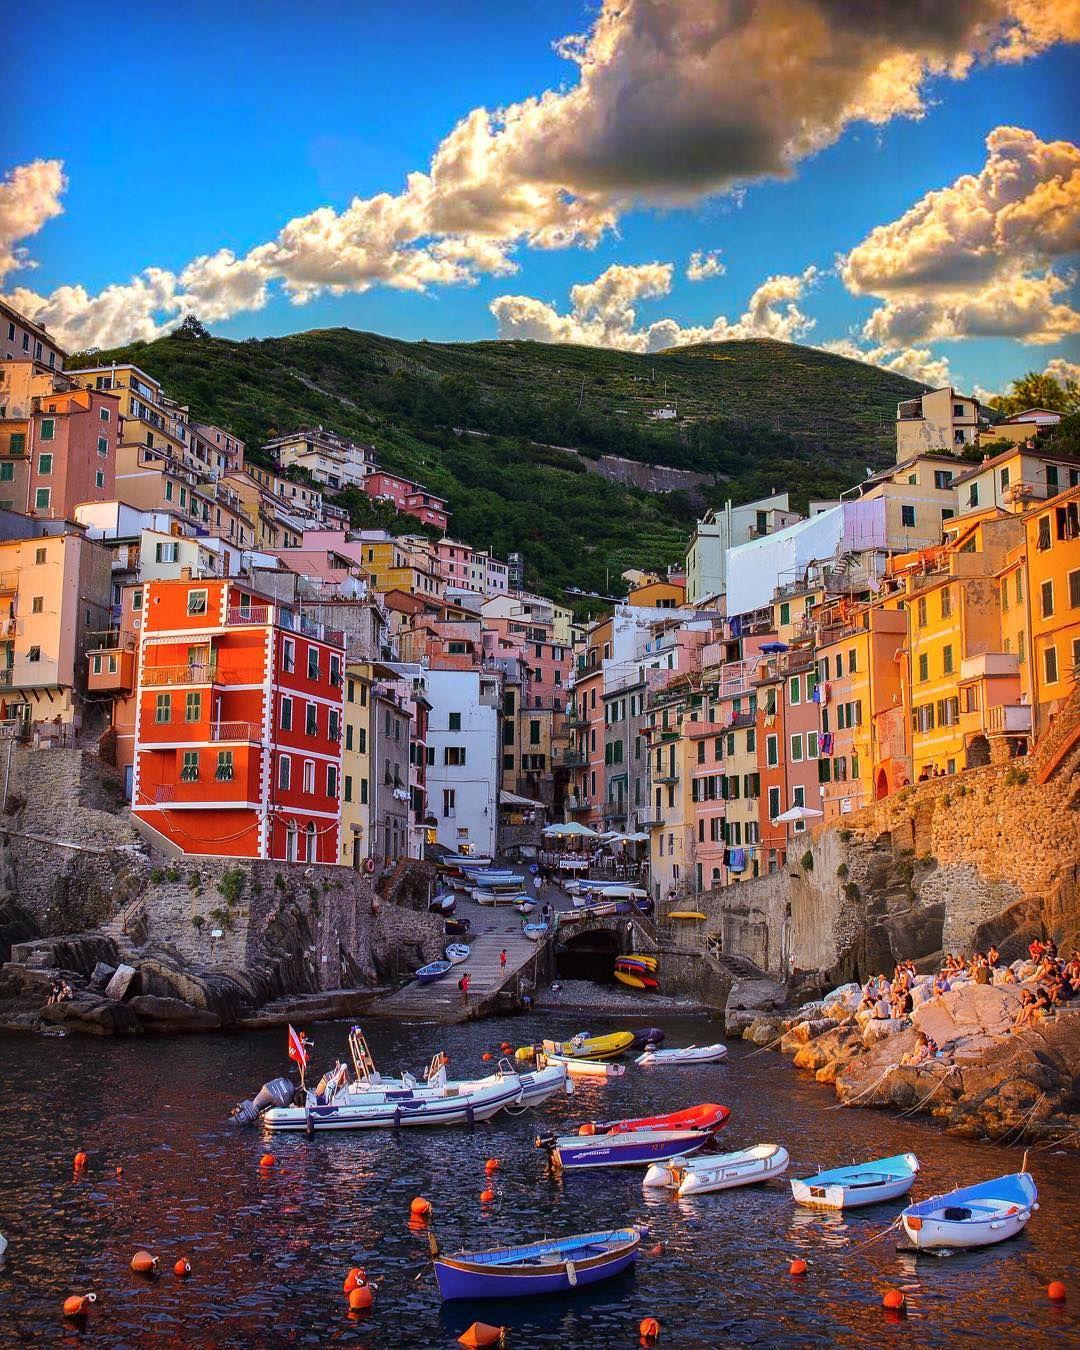 """✨Good Evening / Night ✨  Location: #Riomaggiore, Cinque Terre - #Italy  #SennaRelax"""